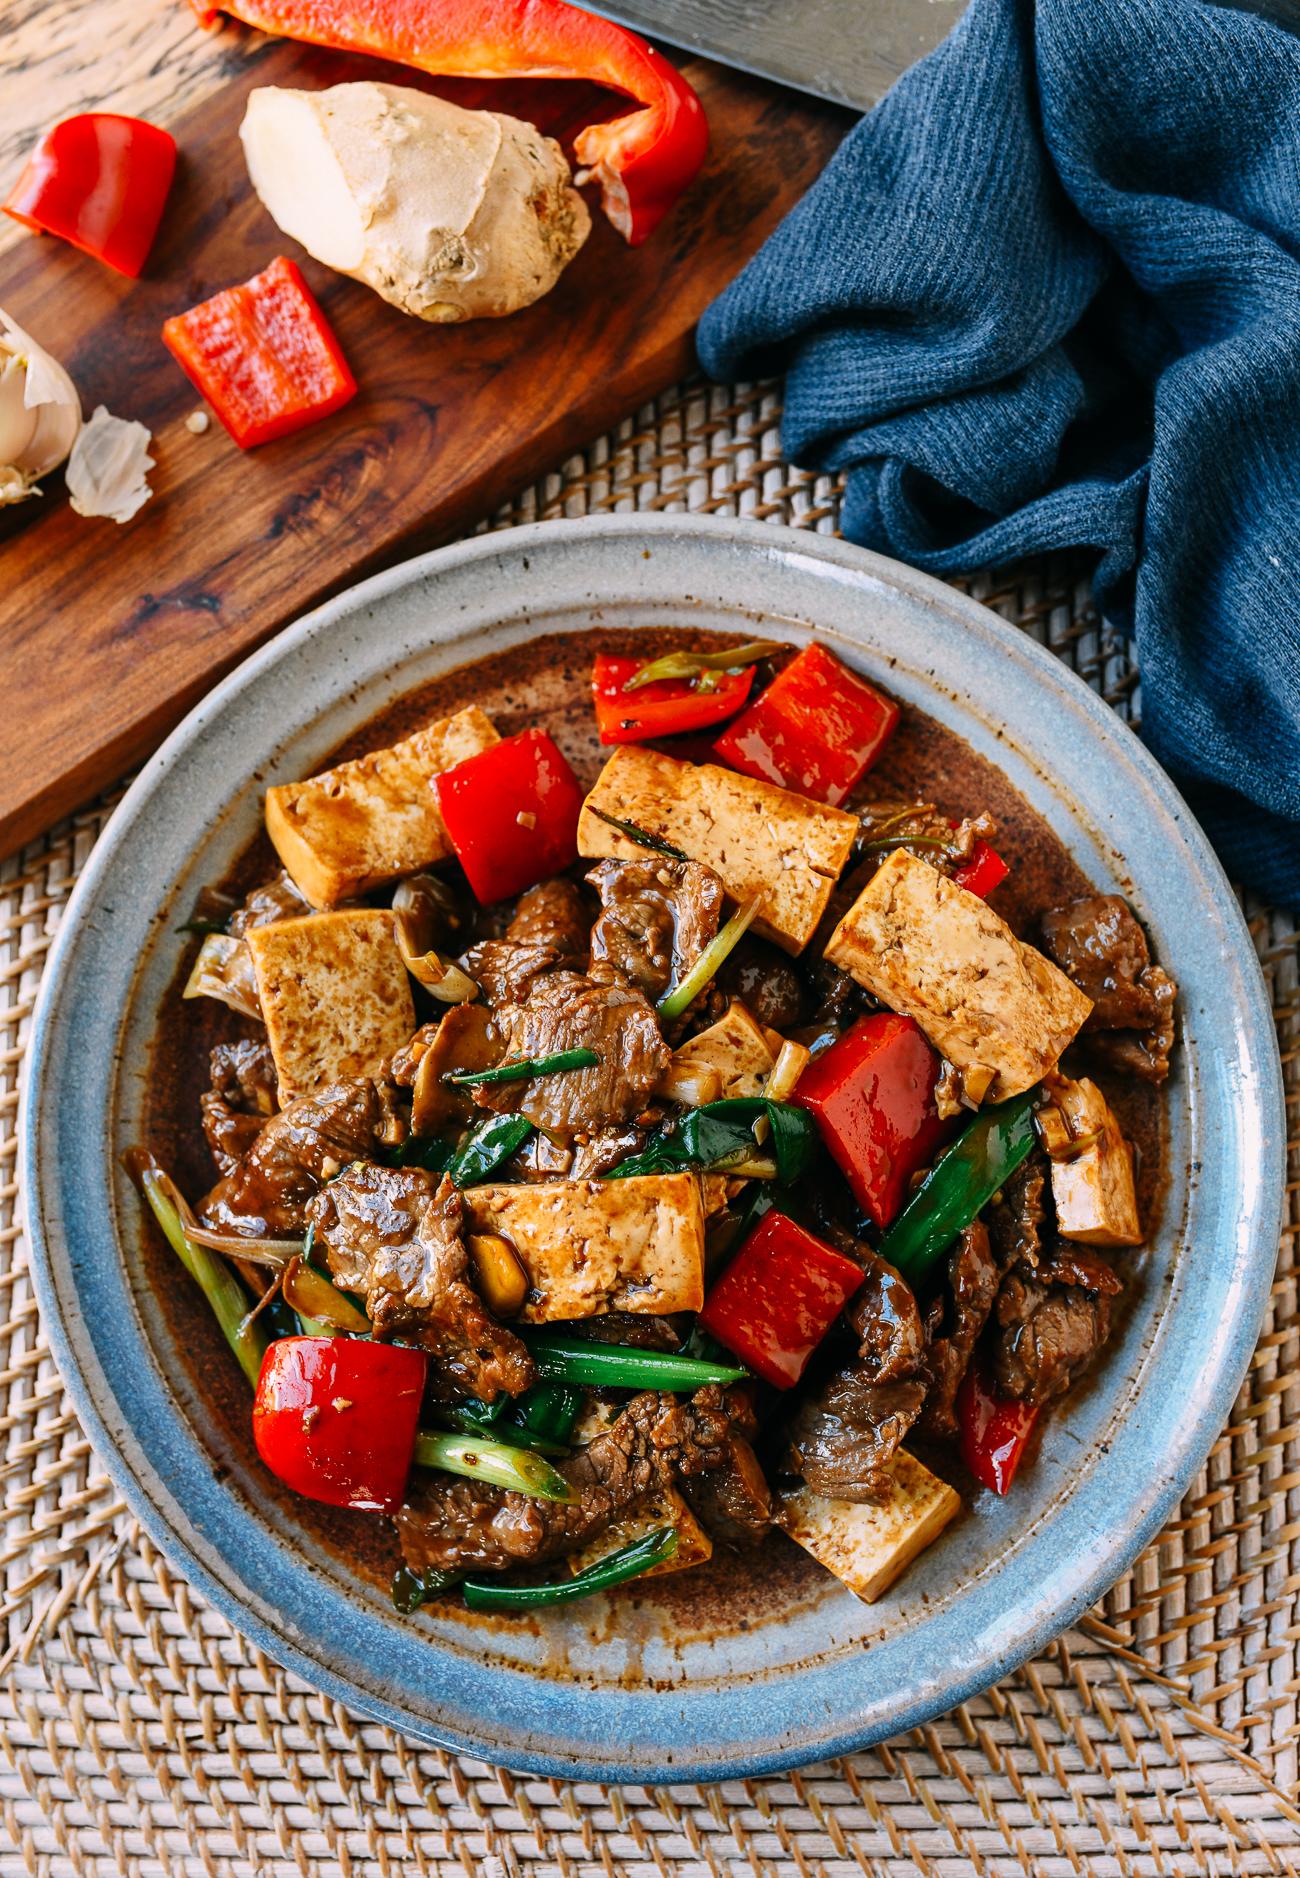 Ginger Scallion Beef and Tofu